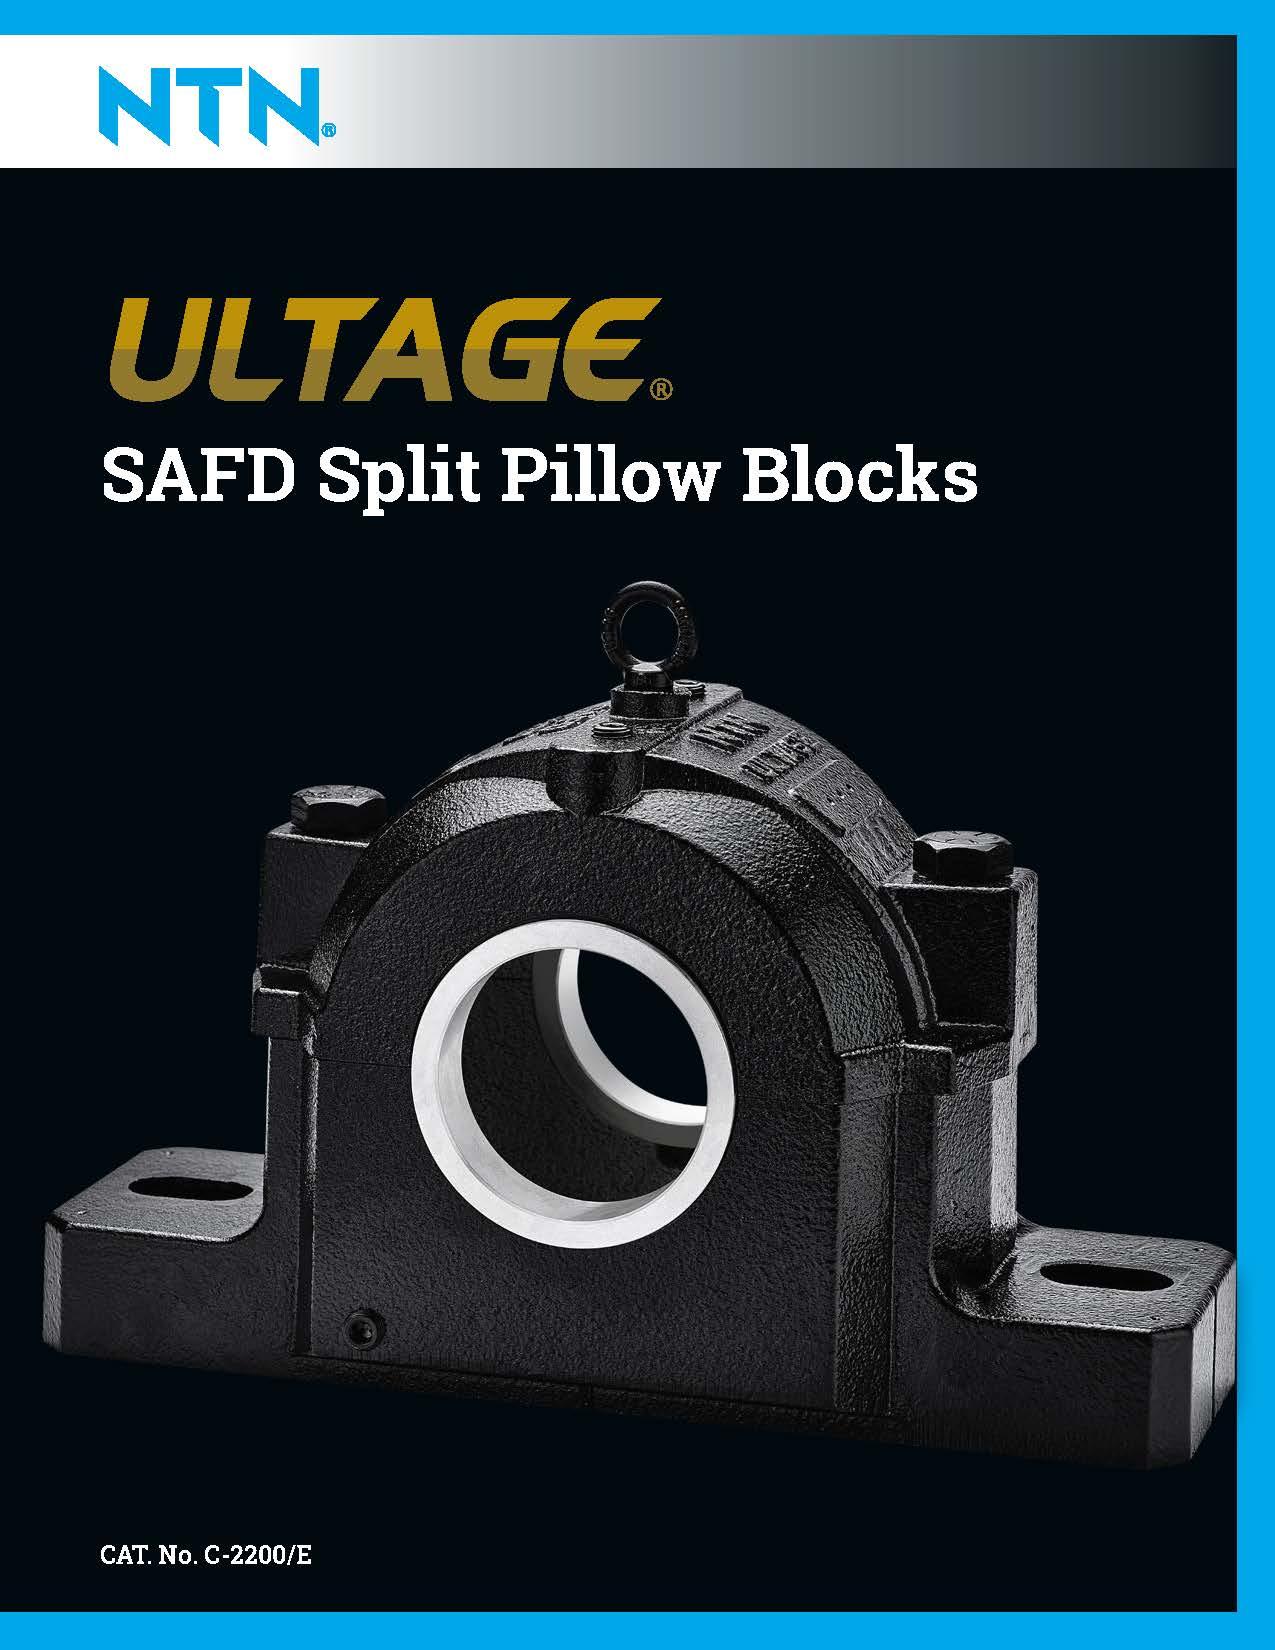 NTN-ULTAGE - SAFD Split Pillow Blocks